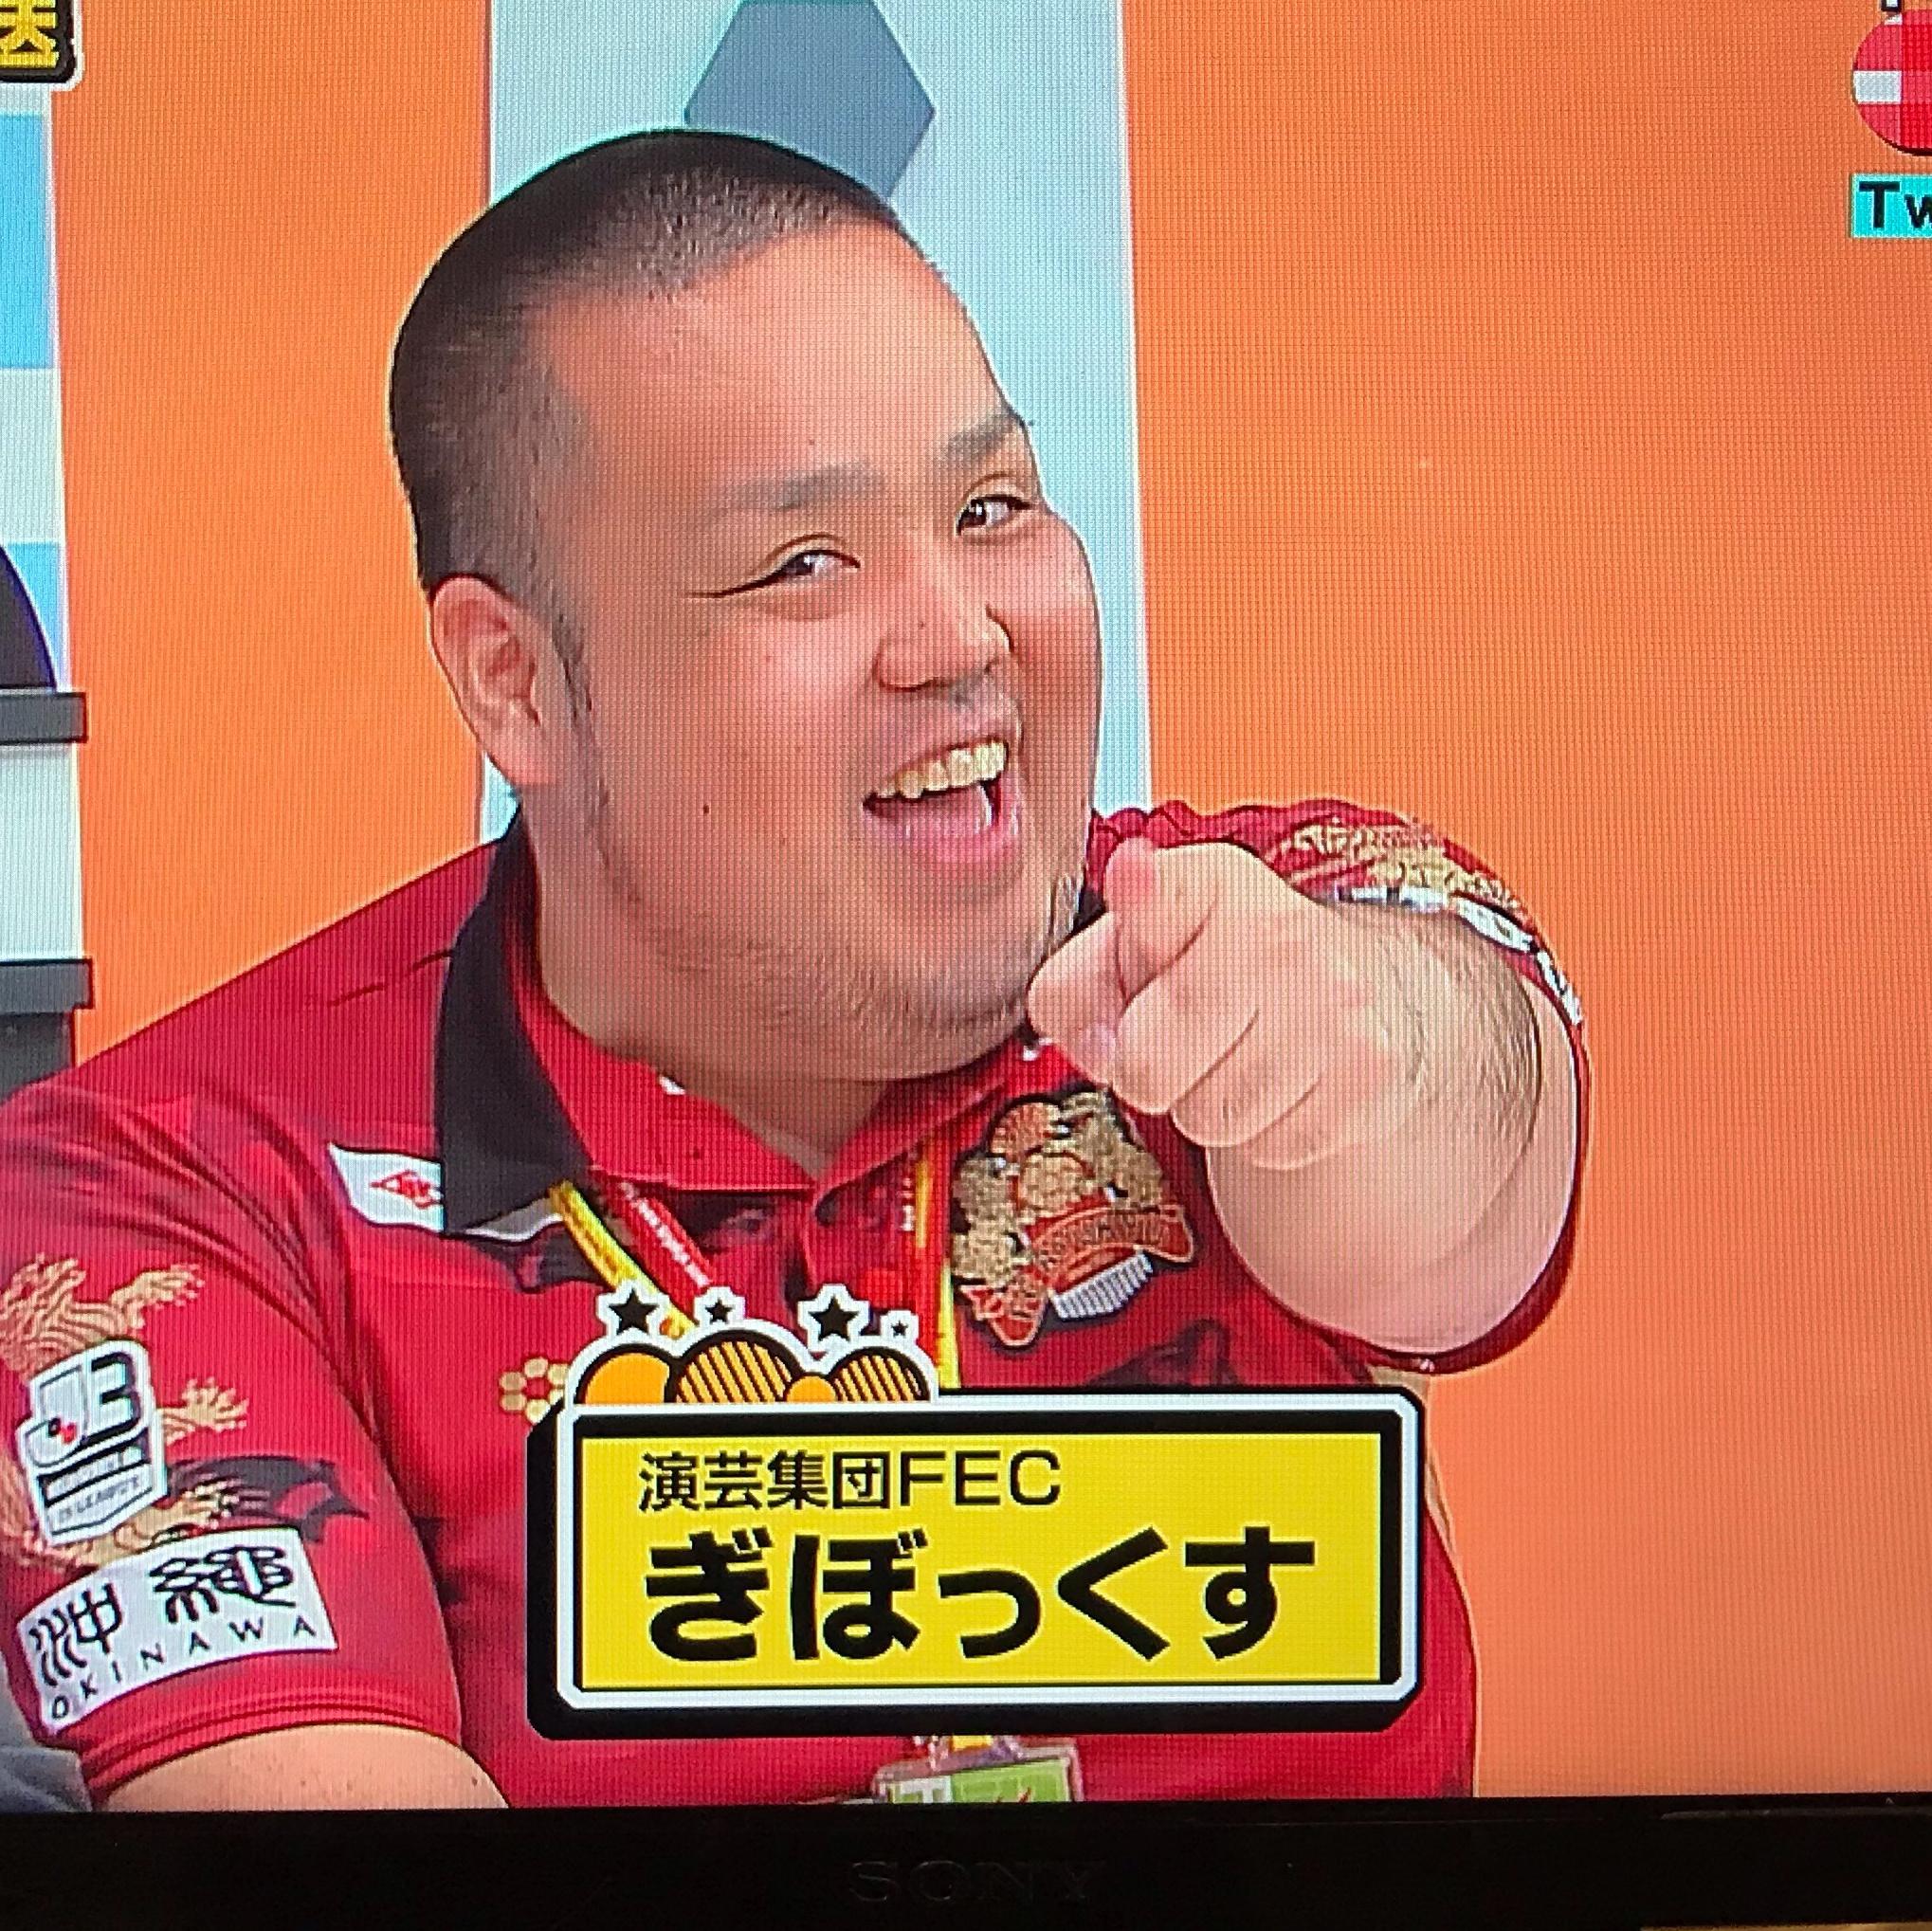 FC琉球🆚アビスパ福岡の感想とベイスターズ